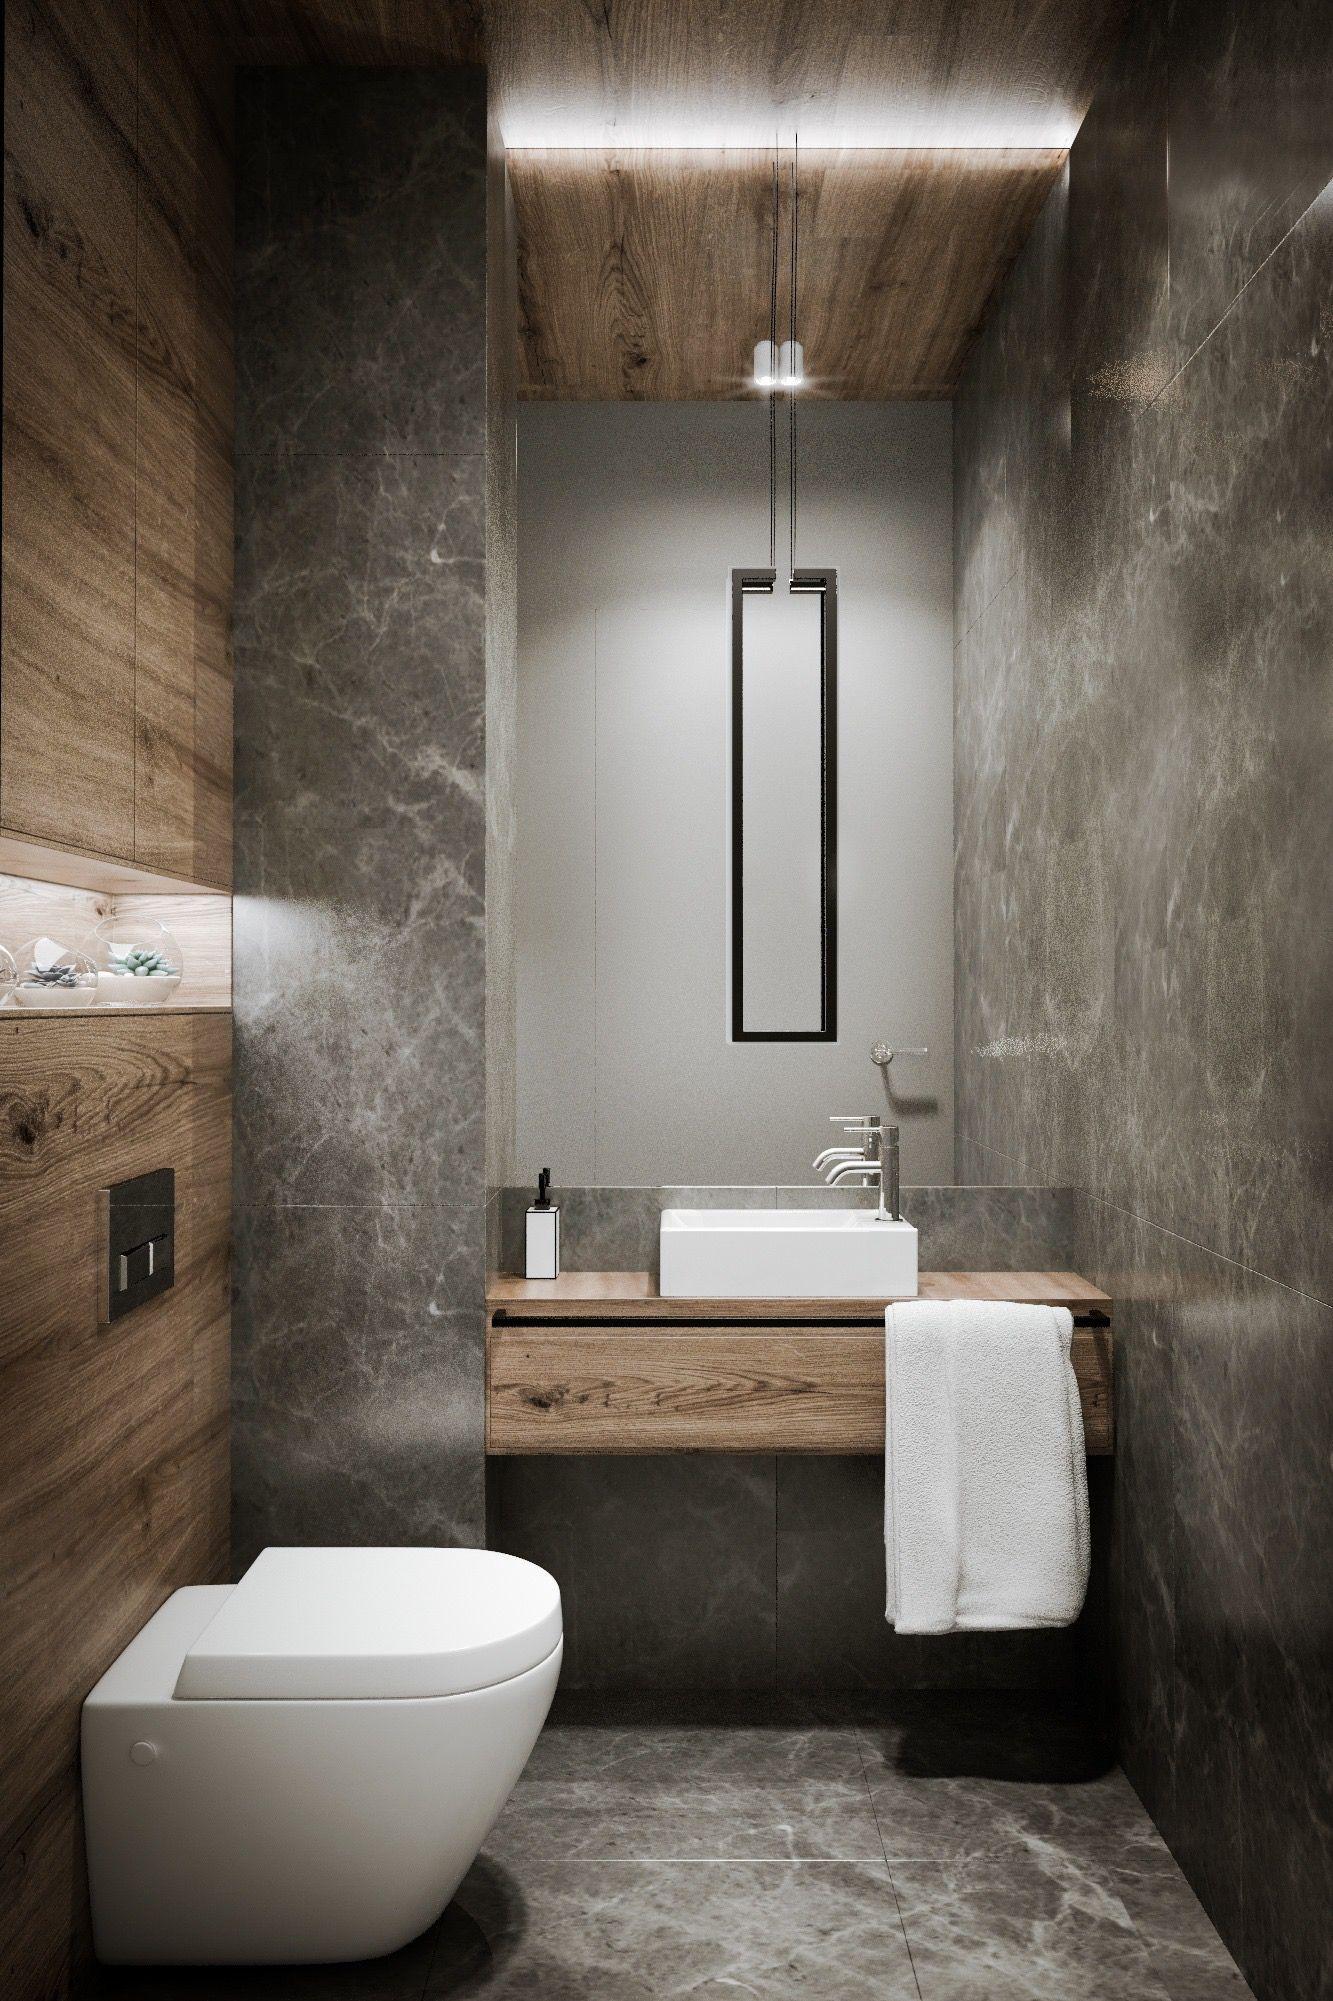 Salle de bains moderne effet b ton cir avec vasque carr e for Best home catalogs